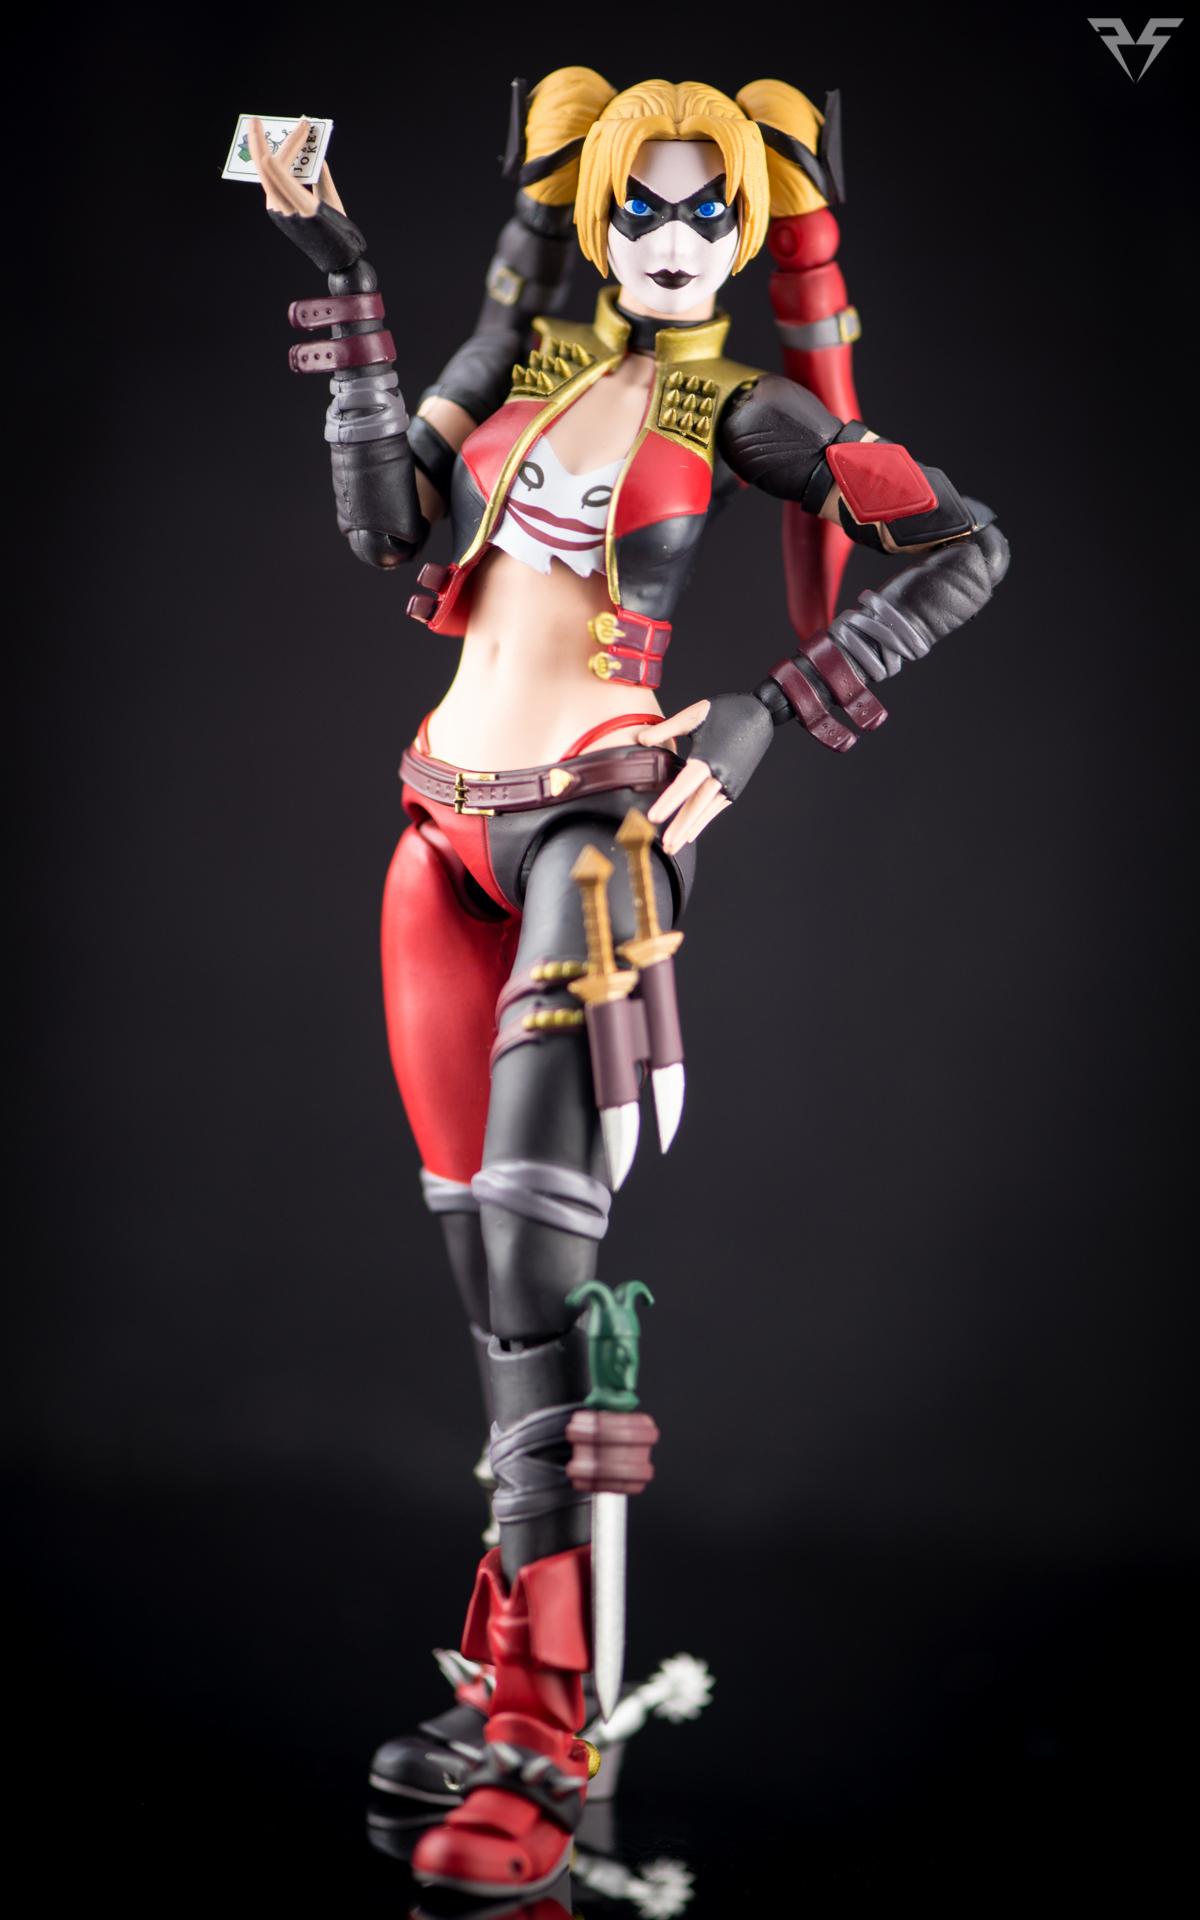 Figuarts Harley Quinn-10.jpg